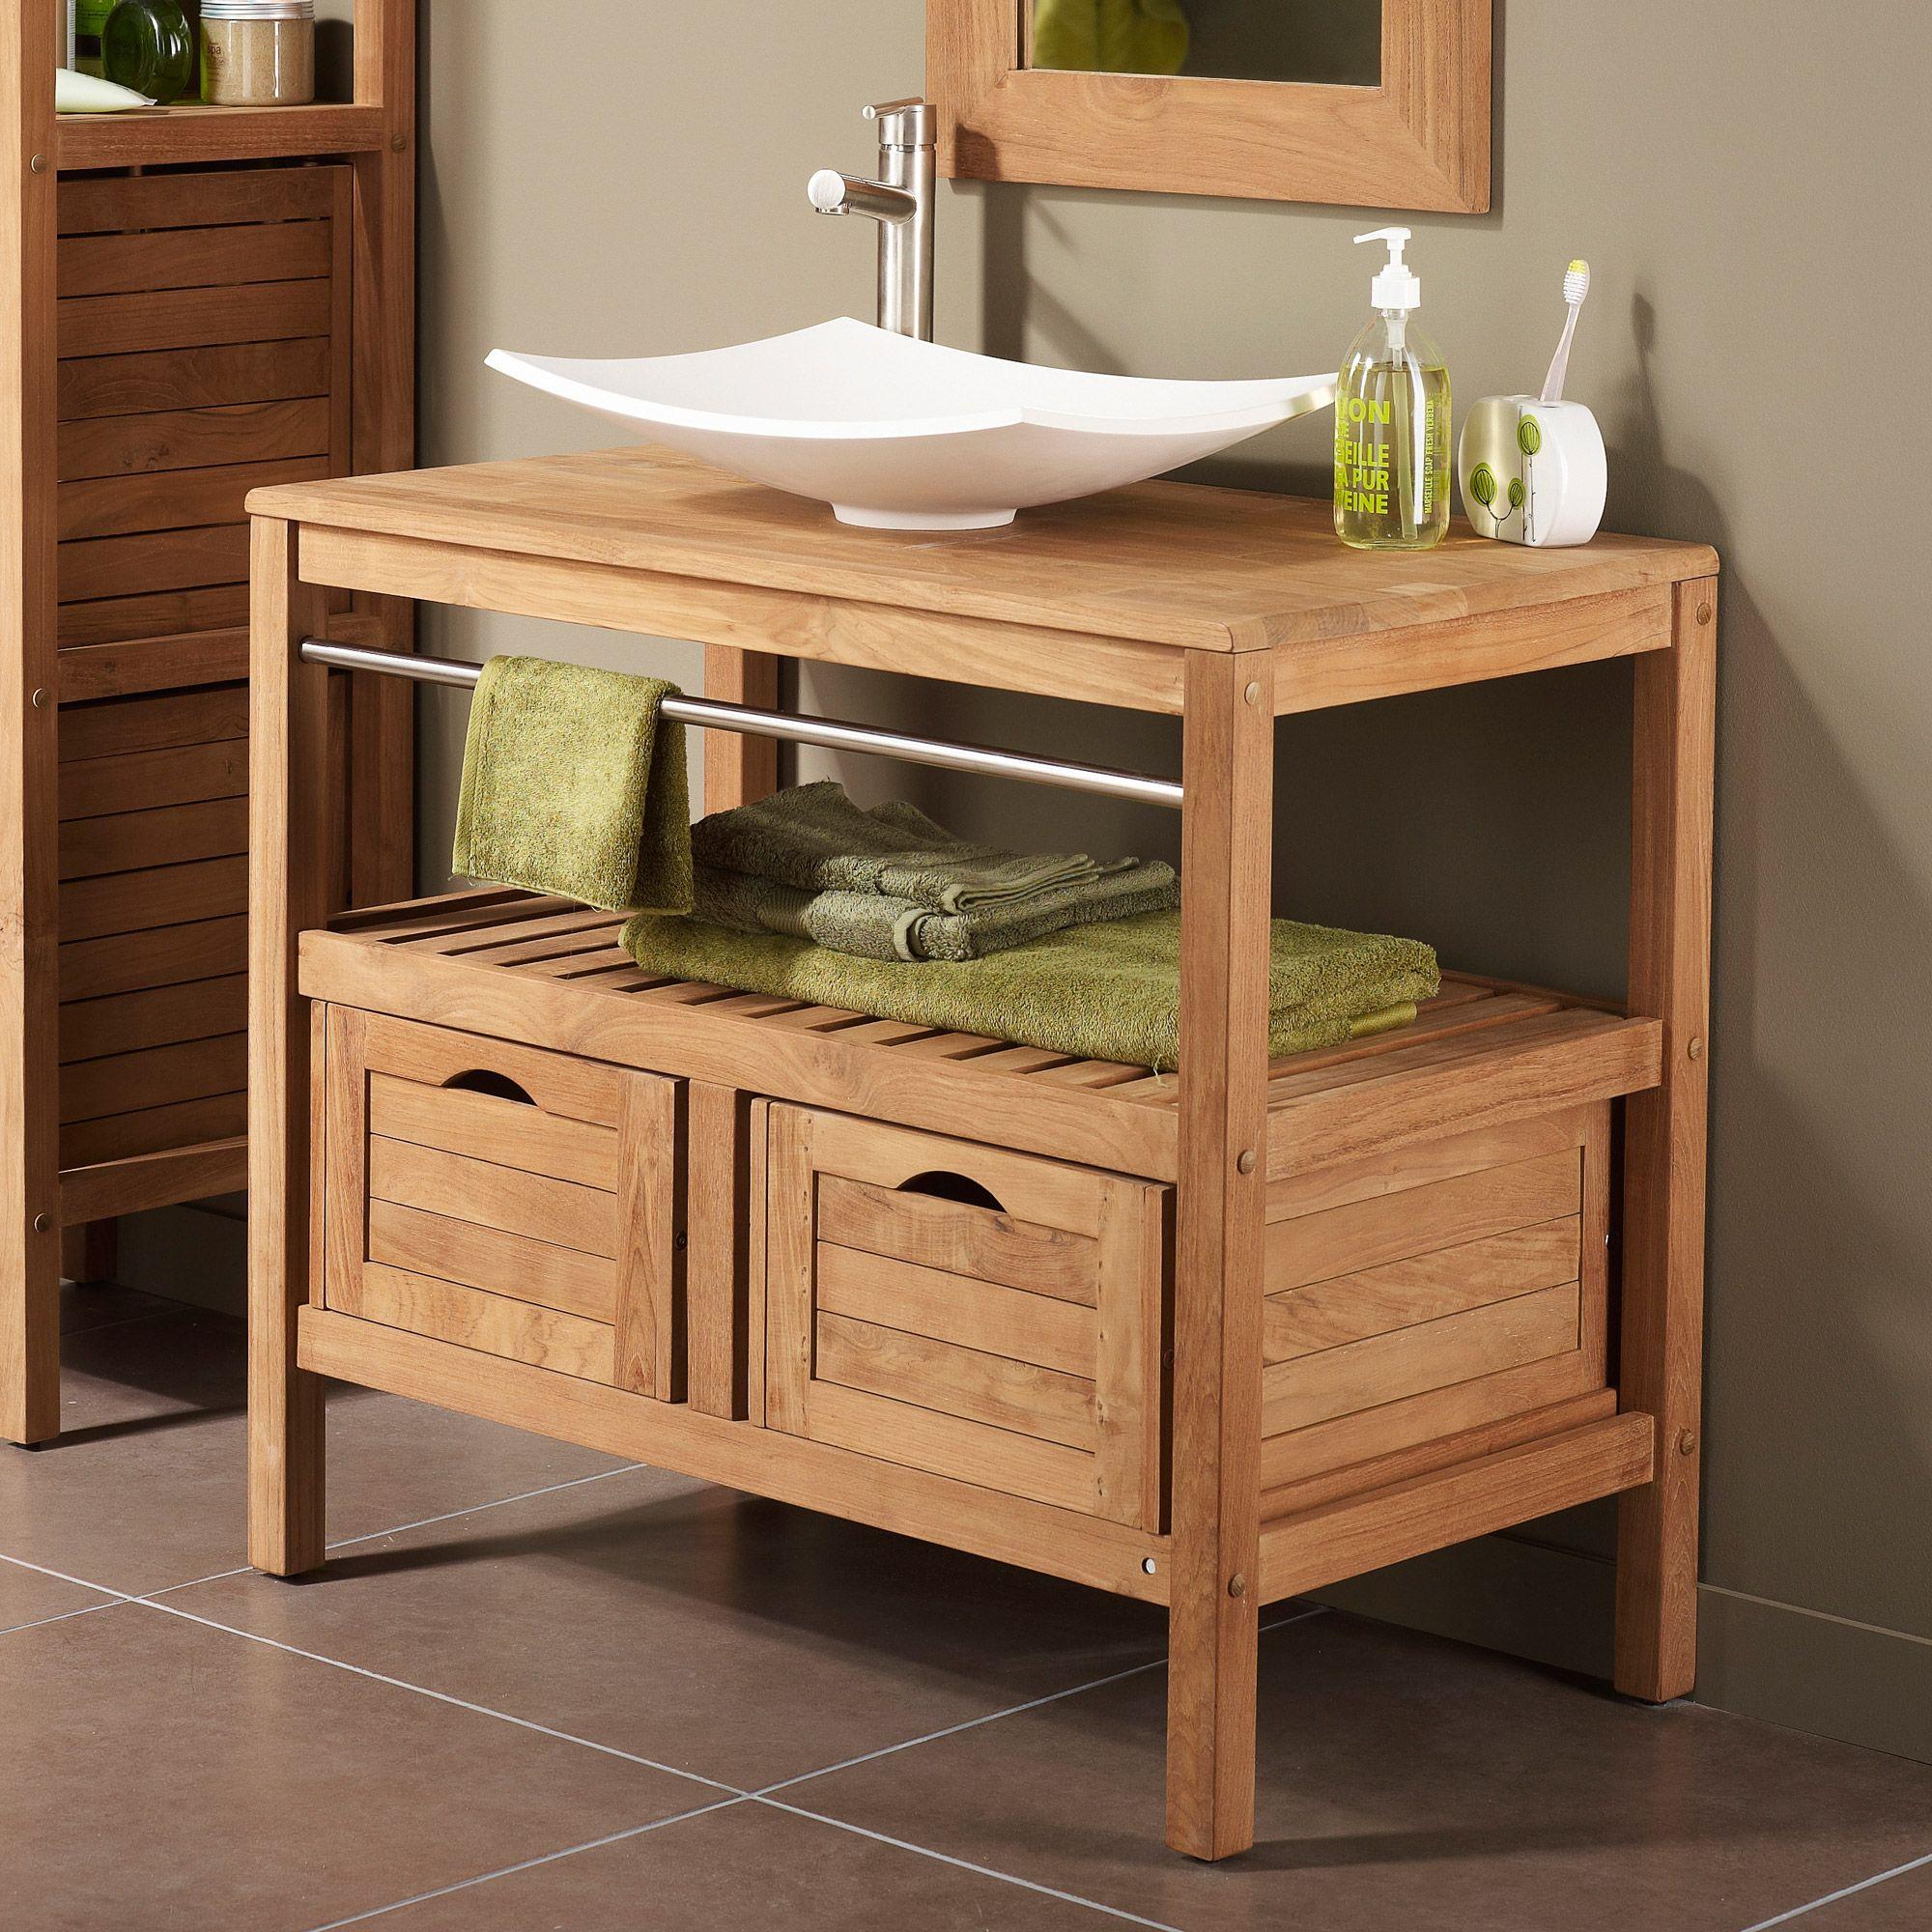 Meuble sous vasque avec plan 2 tiroirs sdb chalet en - Meuble sous vasque de salle de bain ...